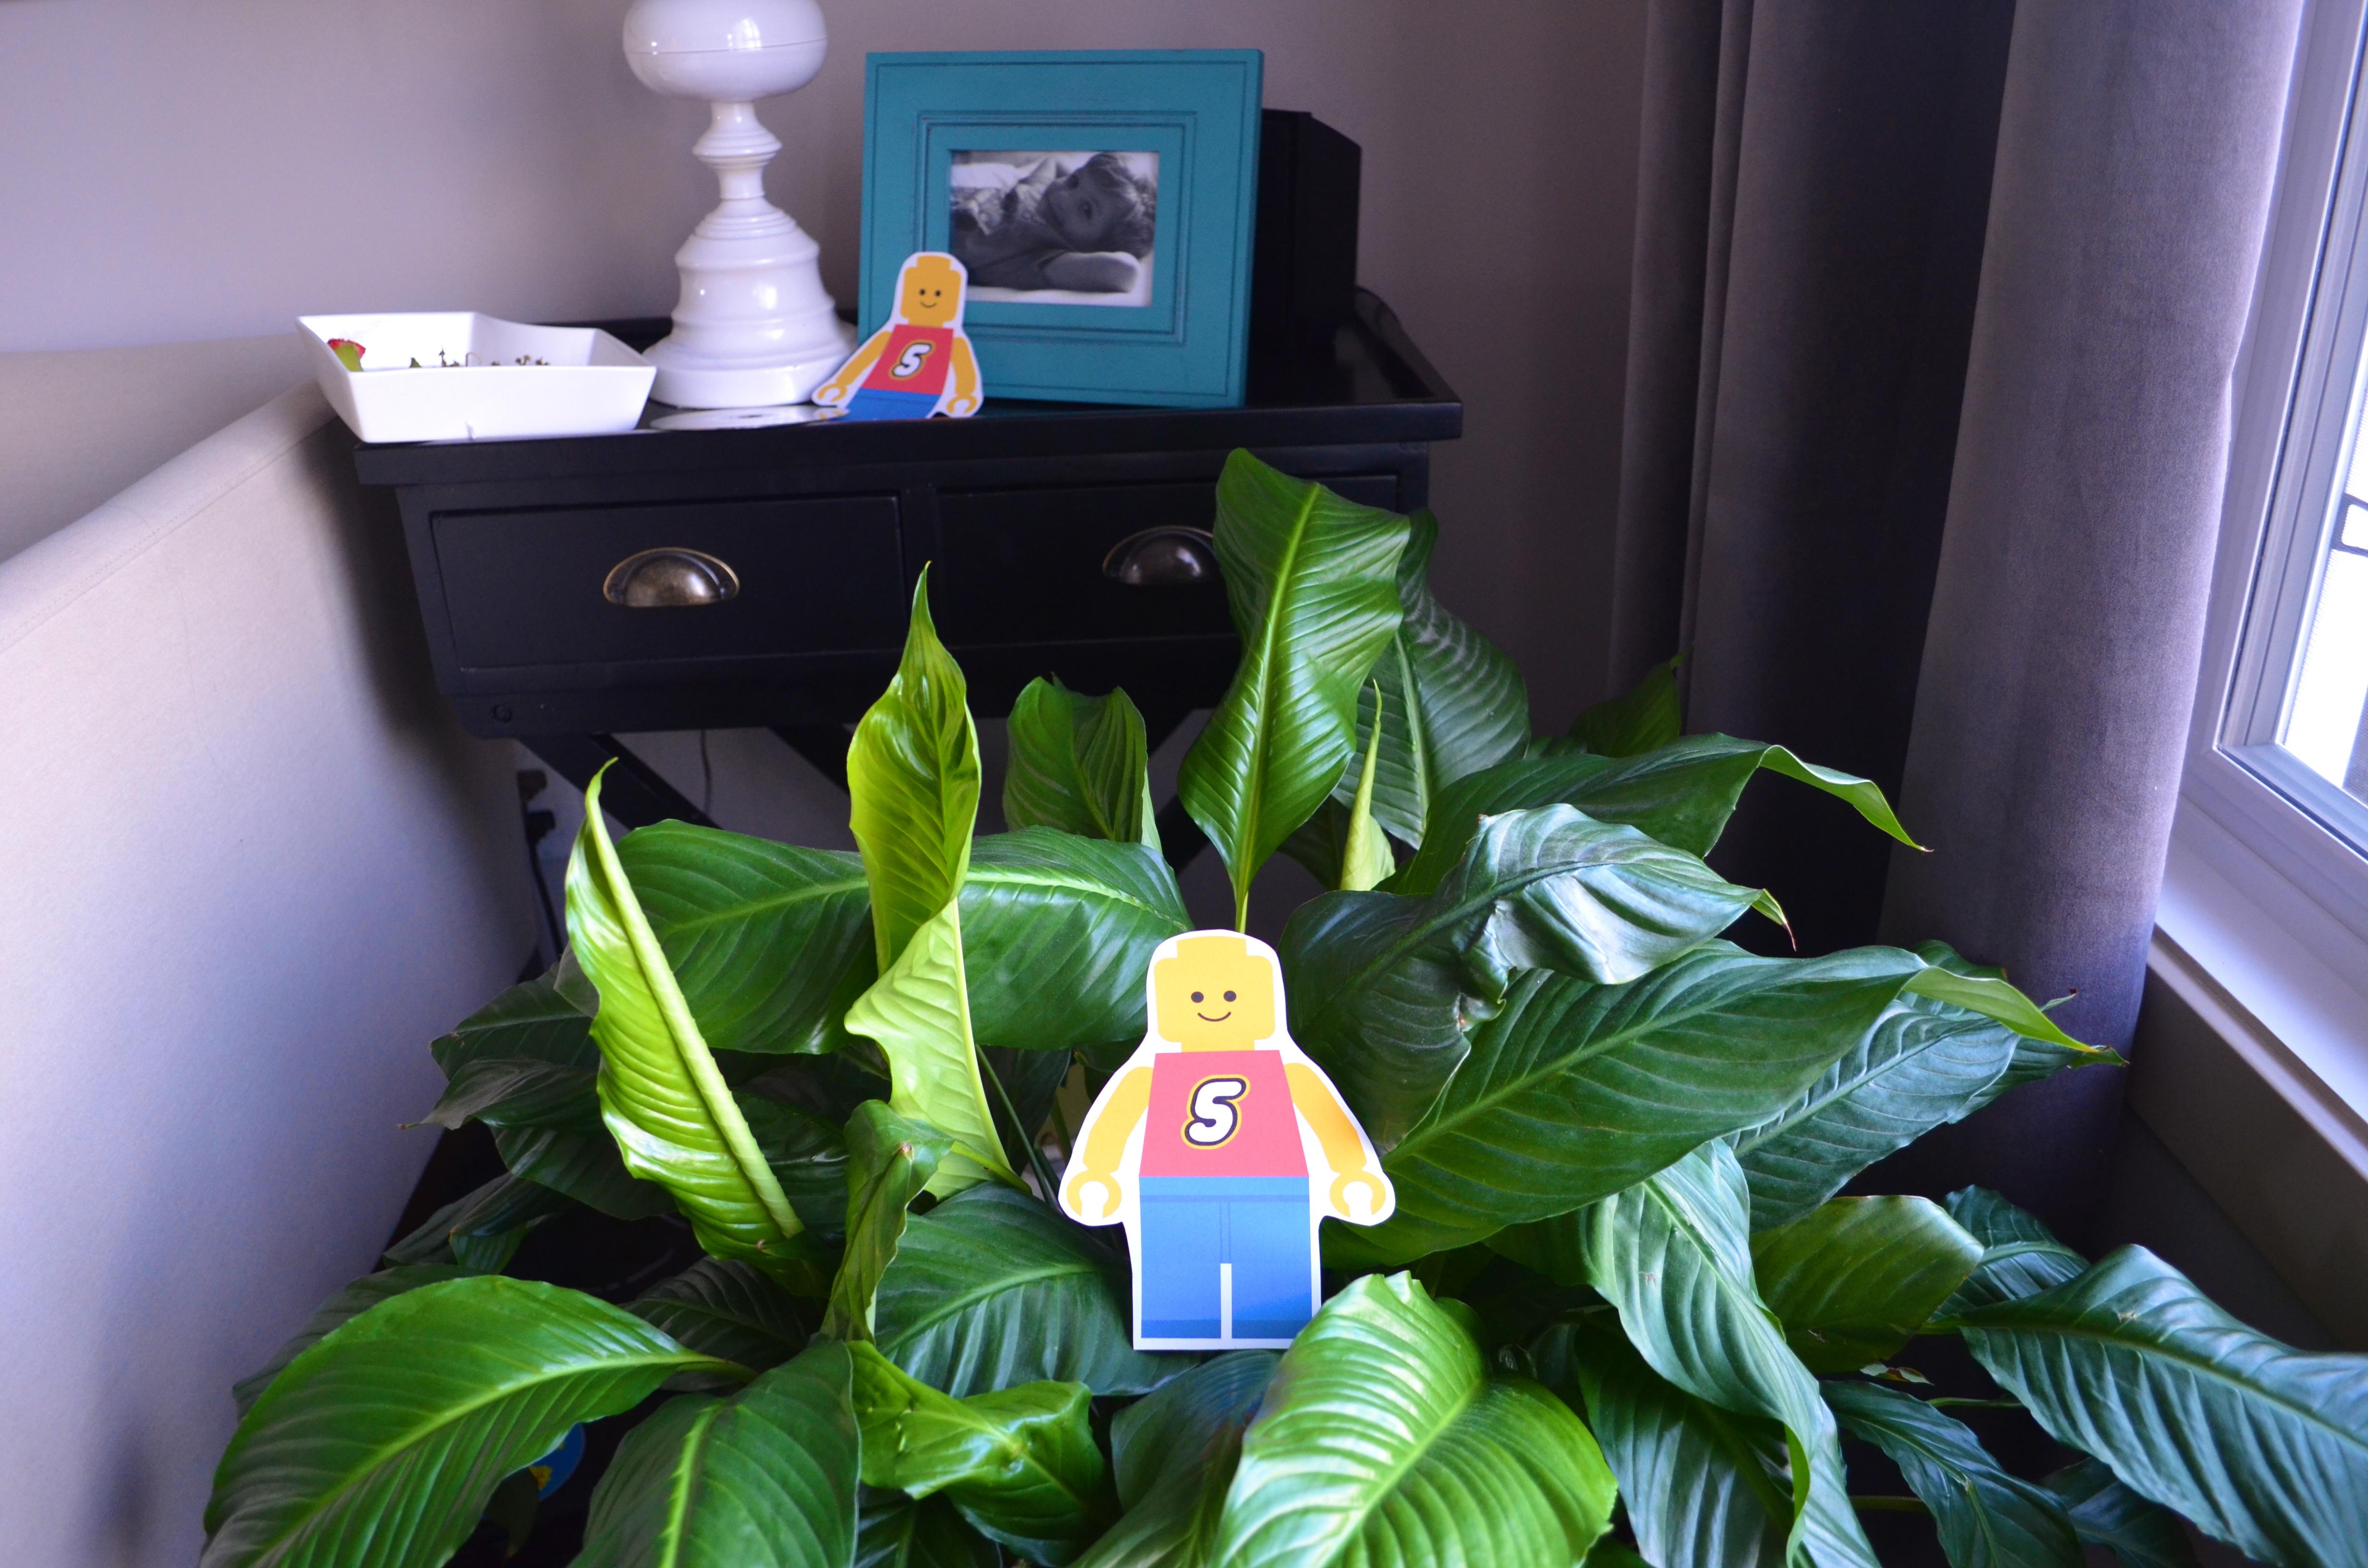 lego duplo playdate for 8 children? pass the chai tea please! #legoduploplay #safetoys #nontoxic